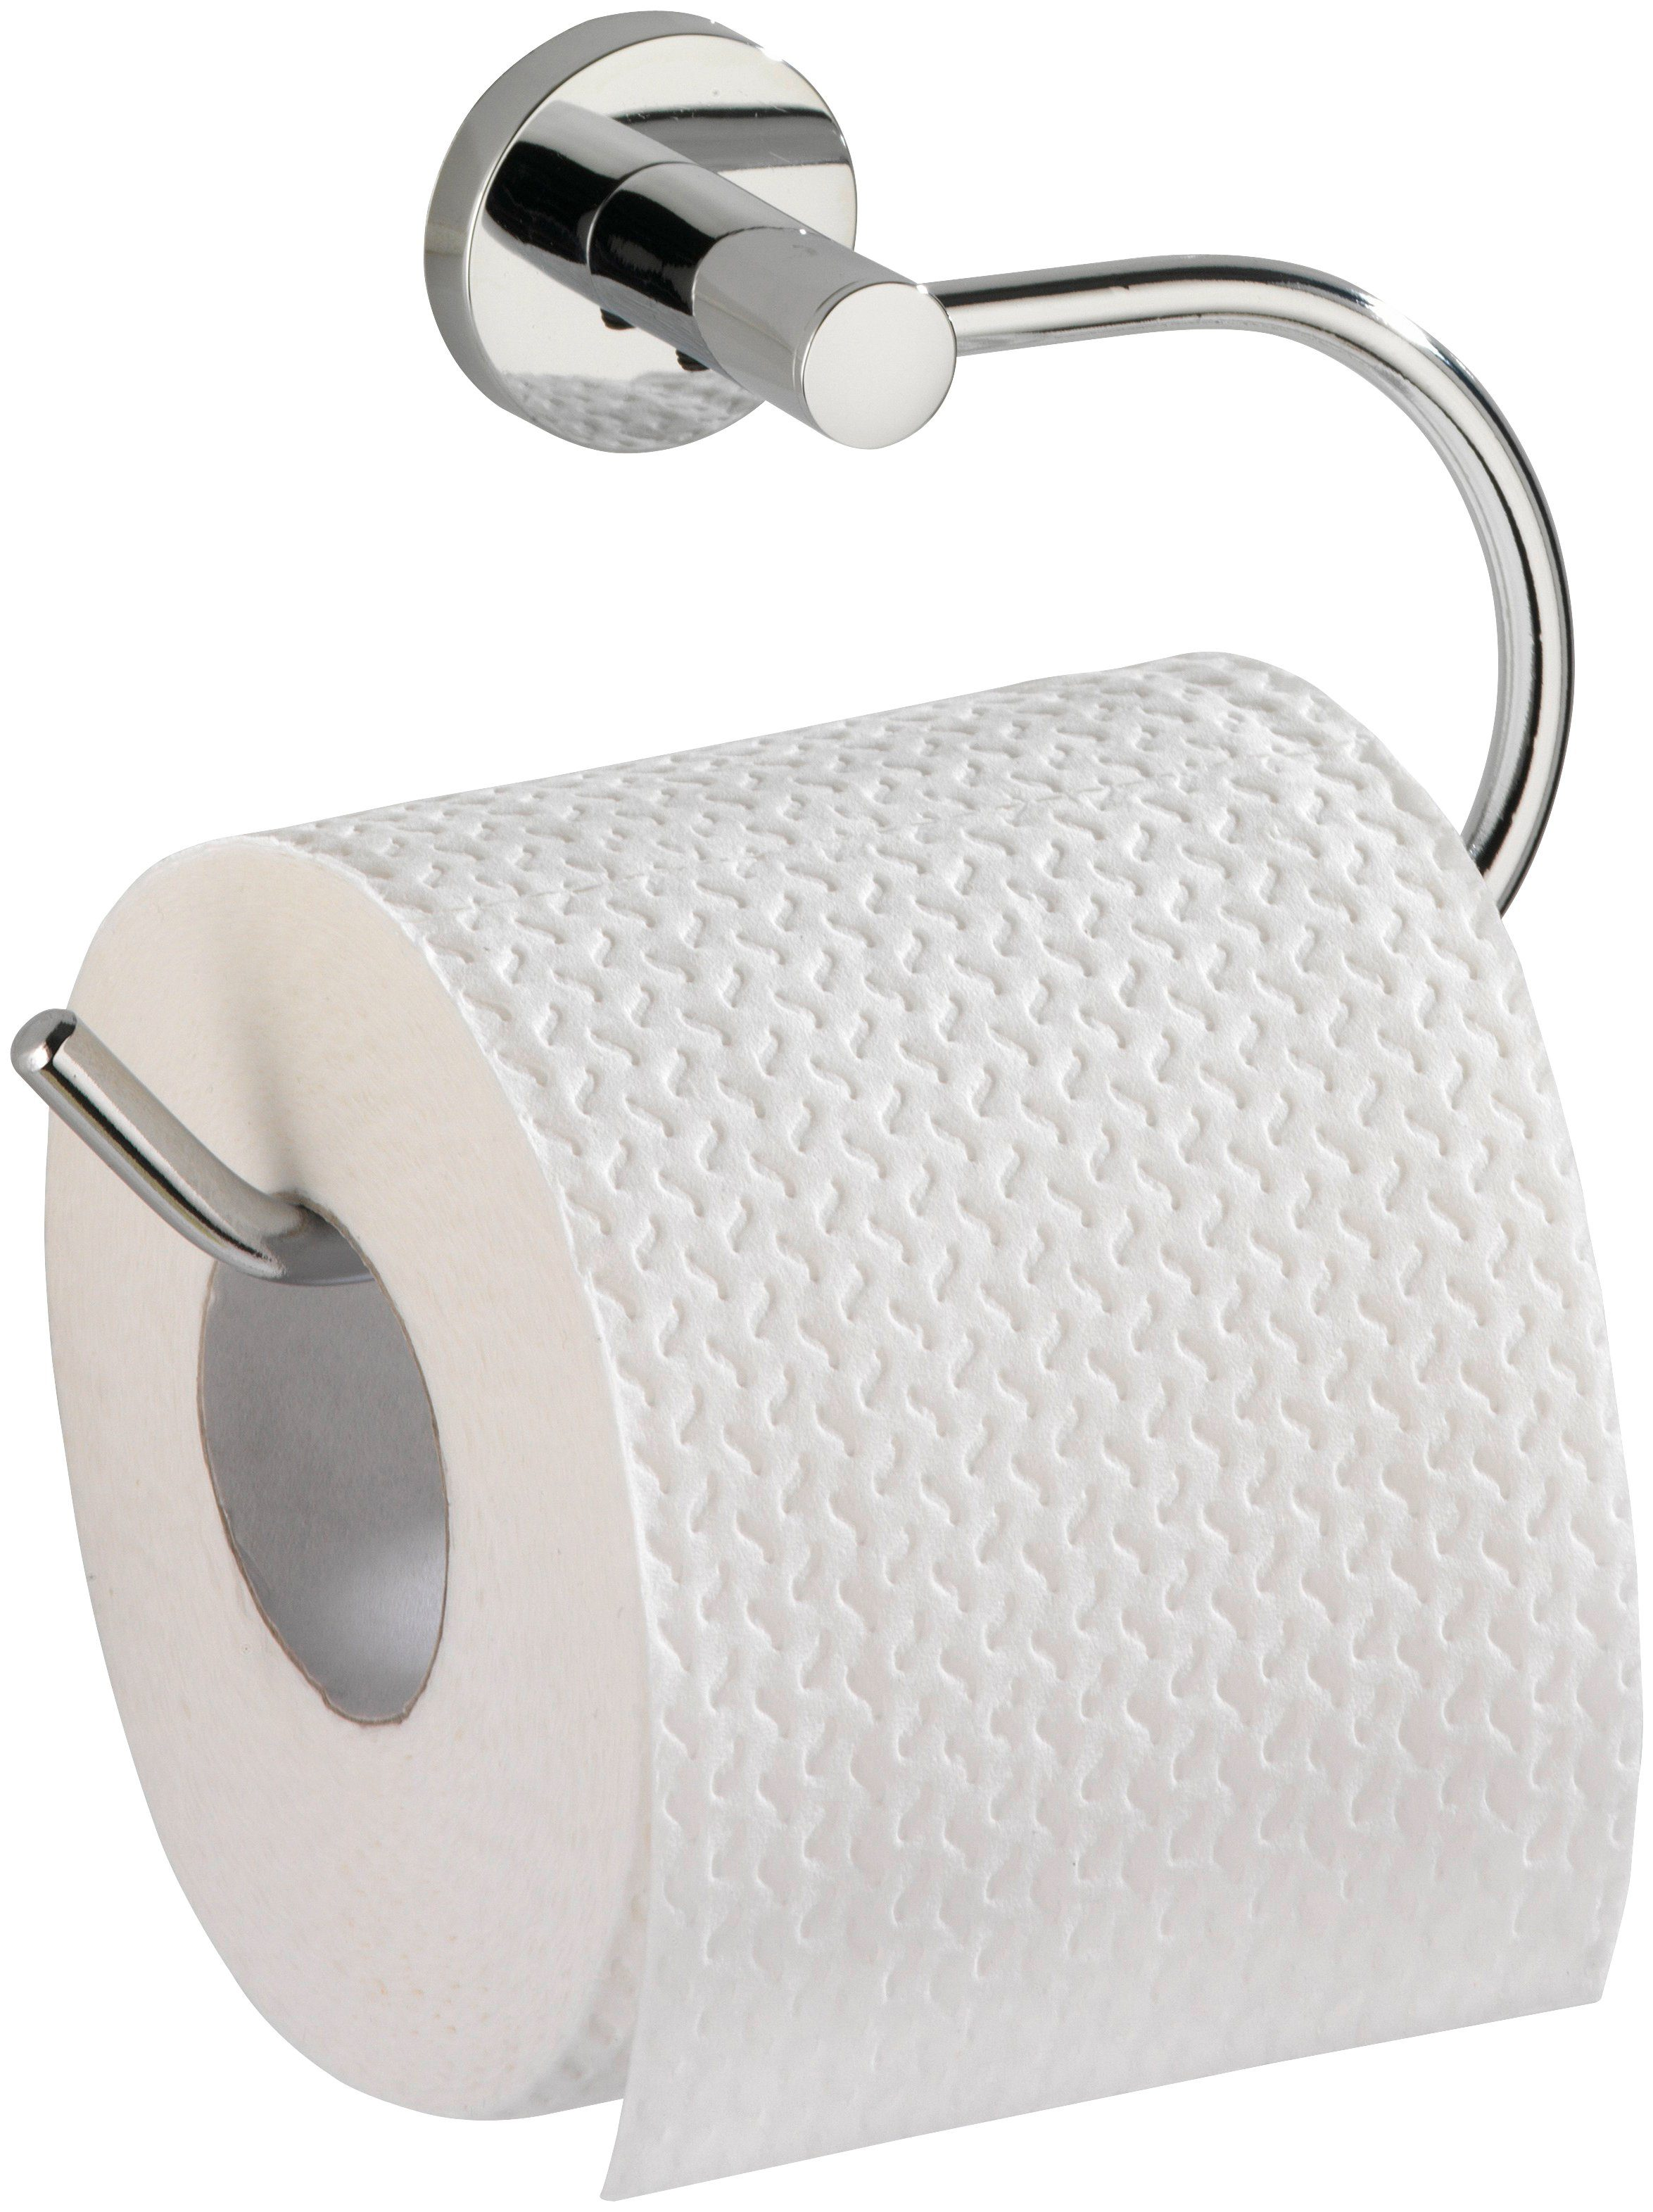 Toilettenpapierhalter »Elegance«